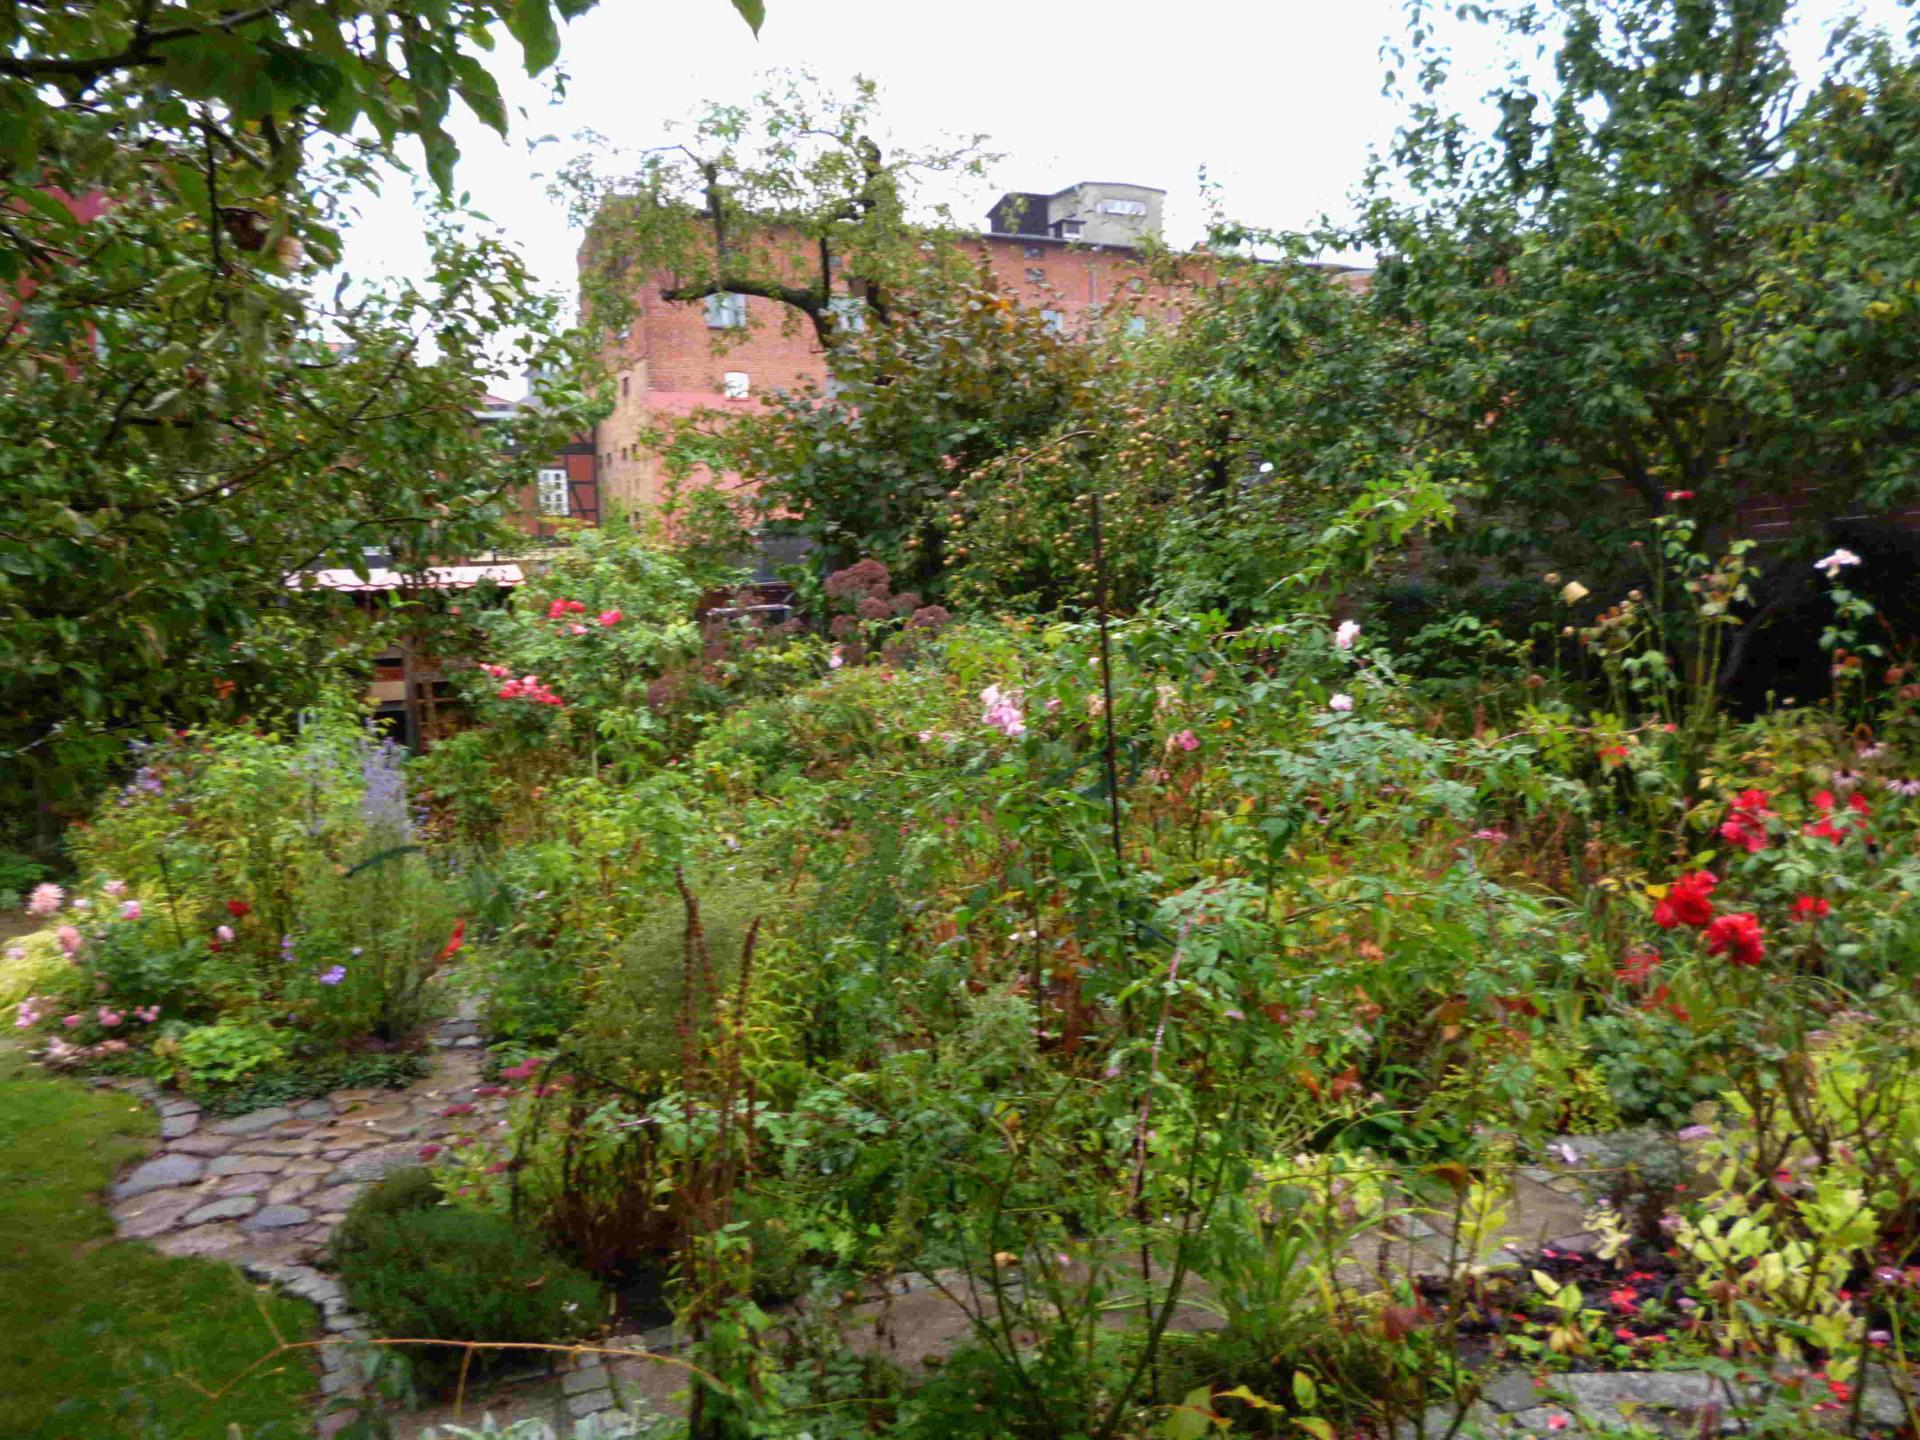 Offene Gartenpfporte 26-09-2020 Bild 21